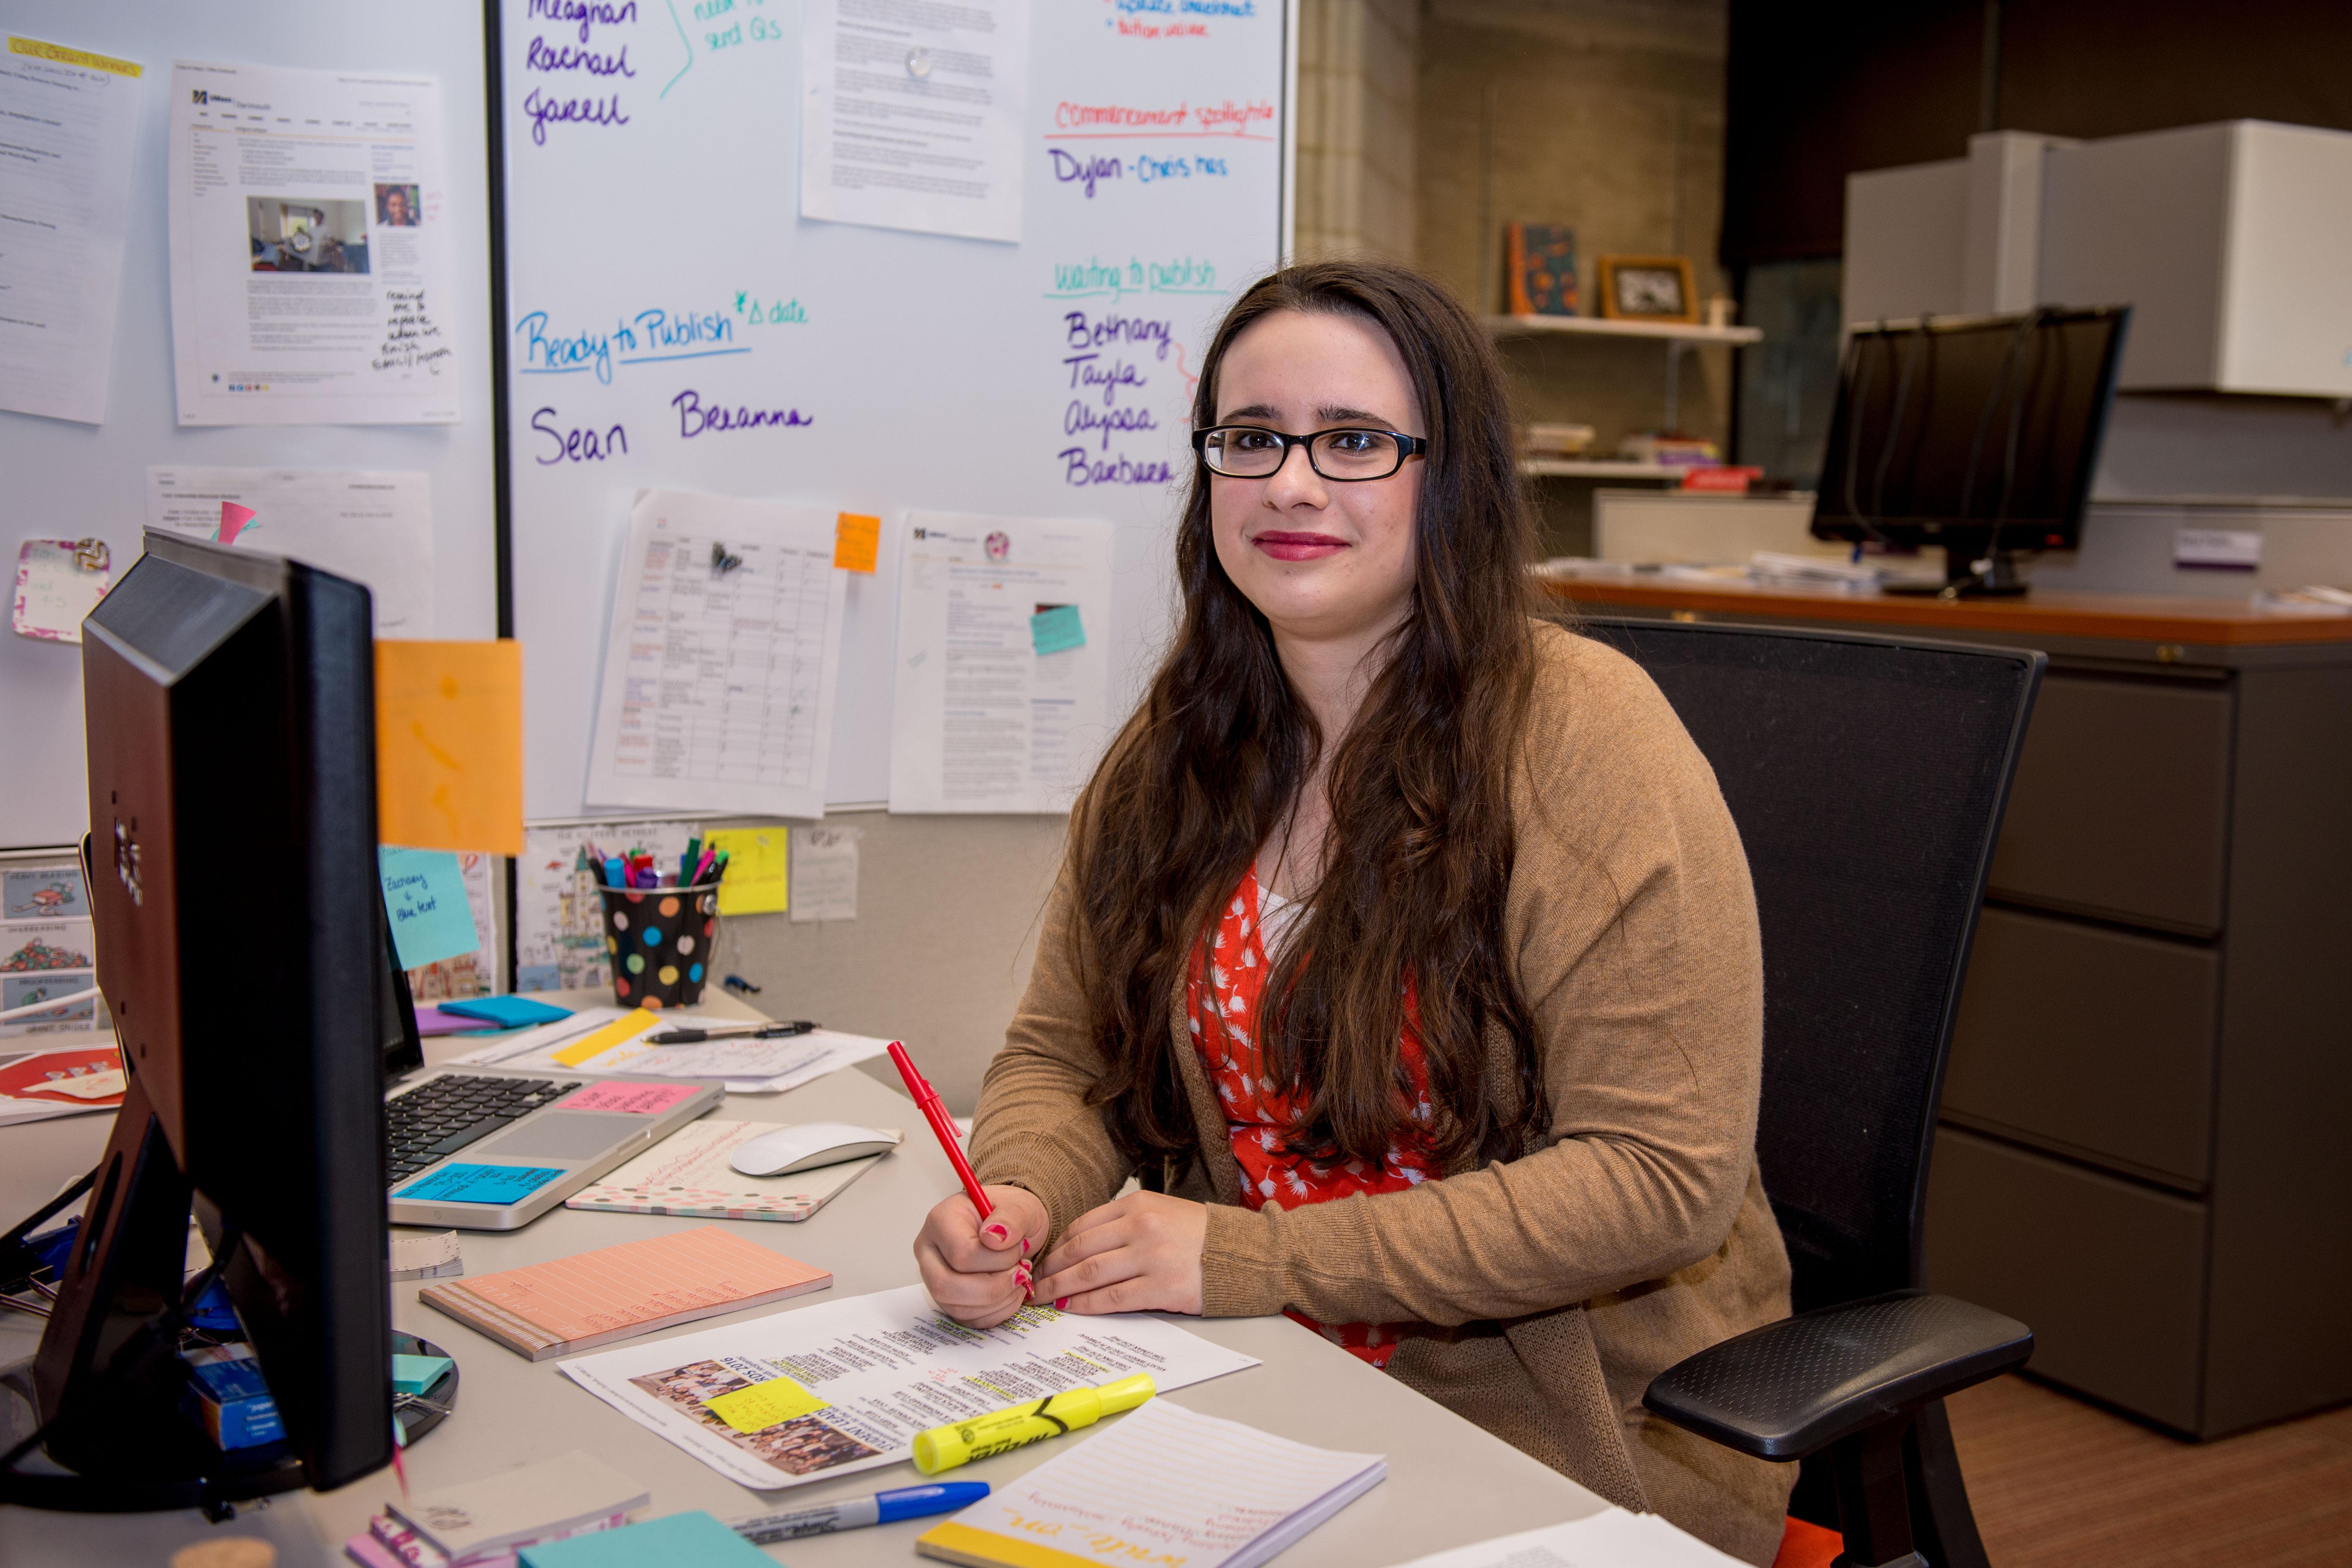 Marissa Matton at University Marketing